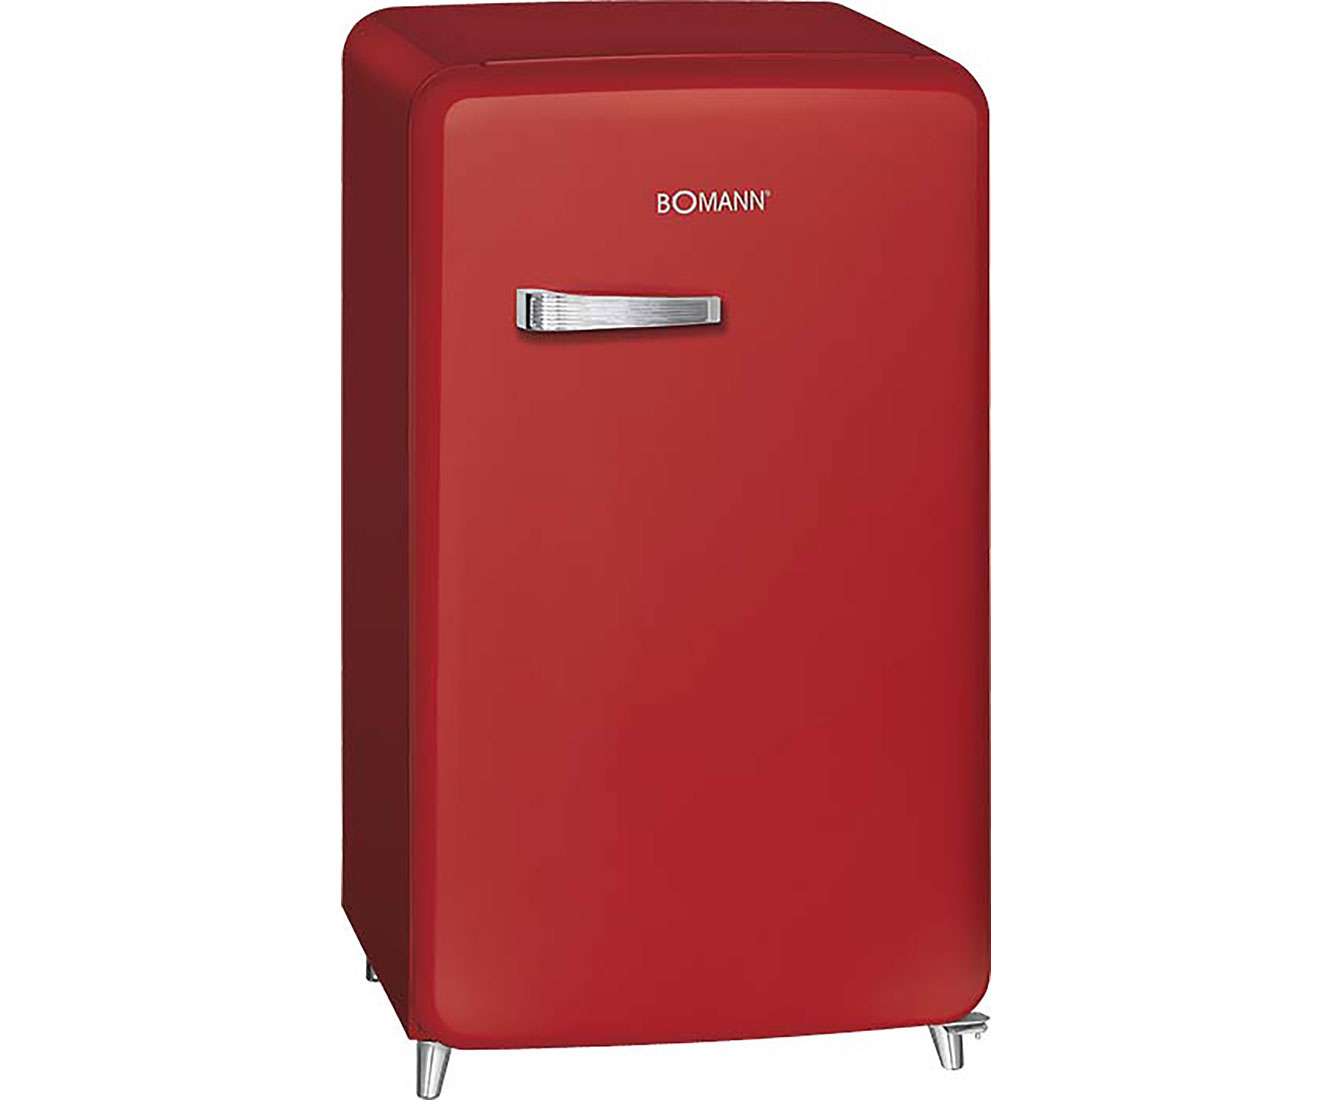 Bomann Kühlschrank Groß : Bomann ksr kühlschrank freistehend cm rot neu ebay